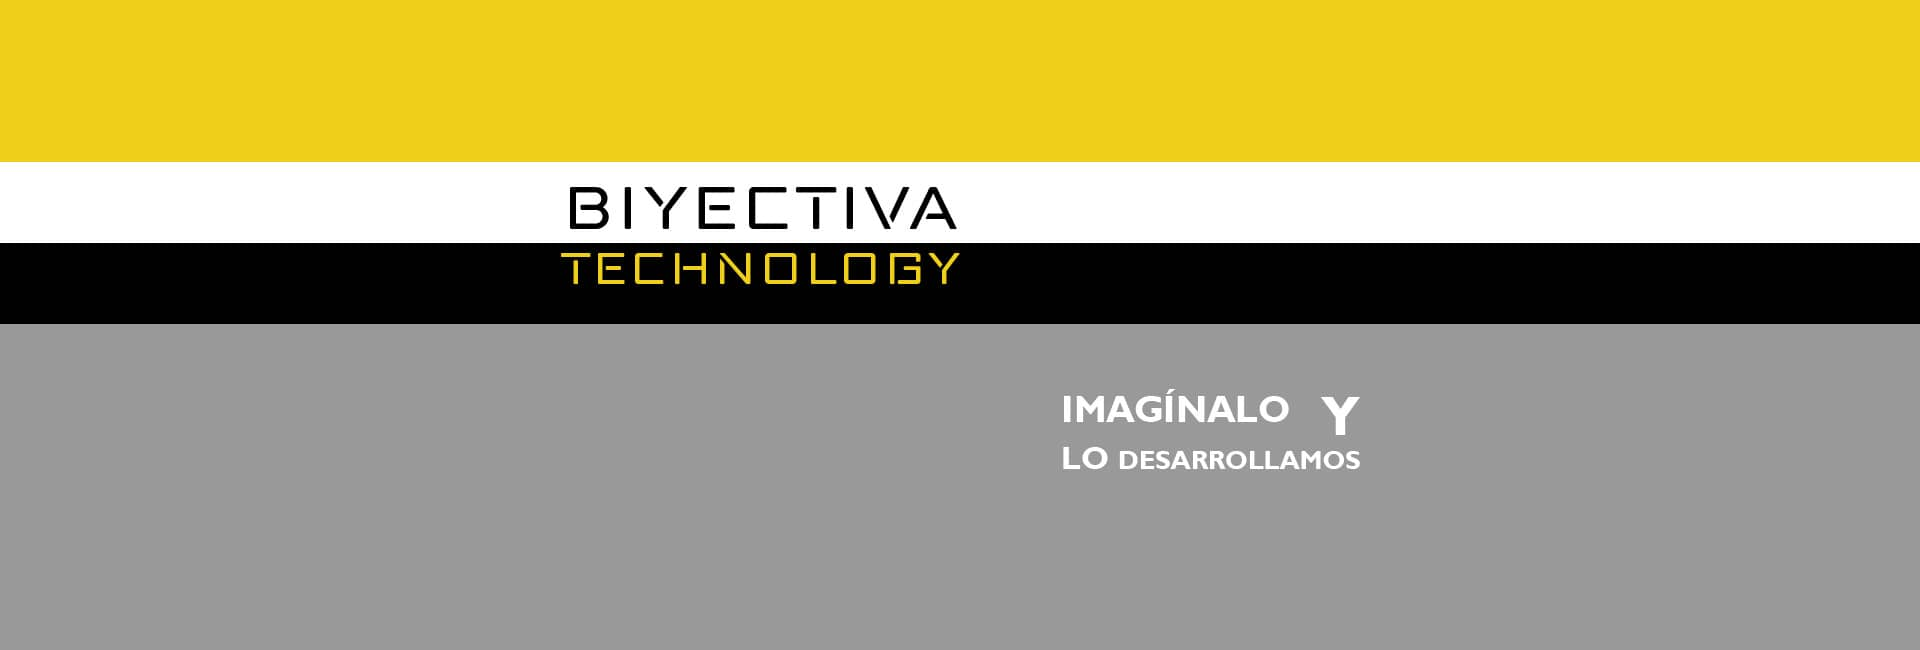 Imagen cabecera de Biyectiva